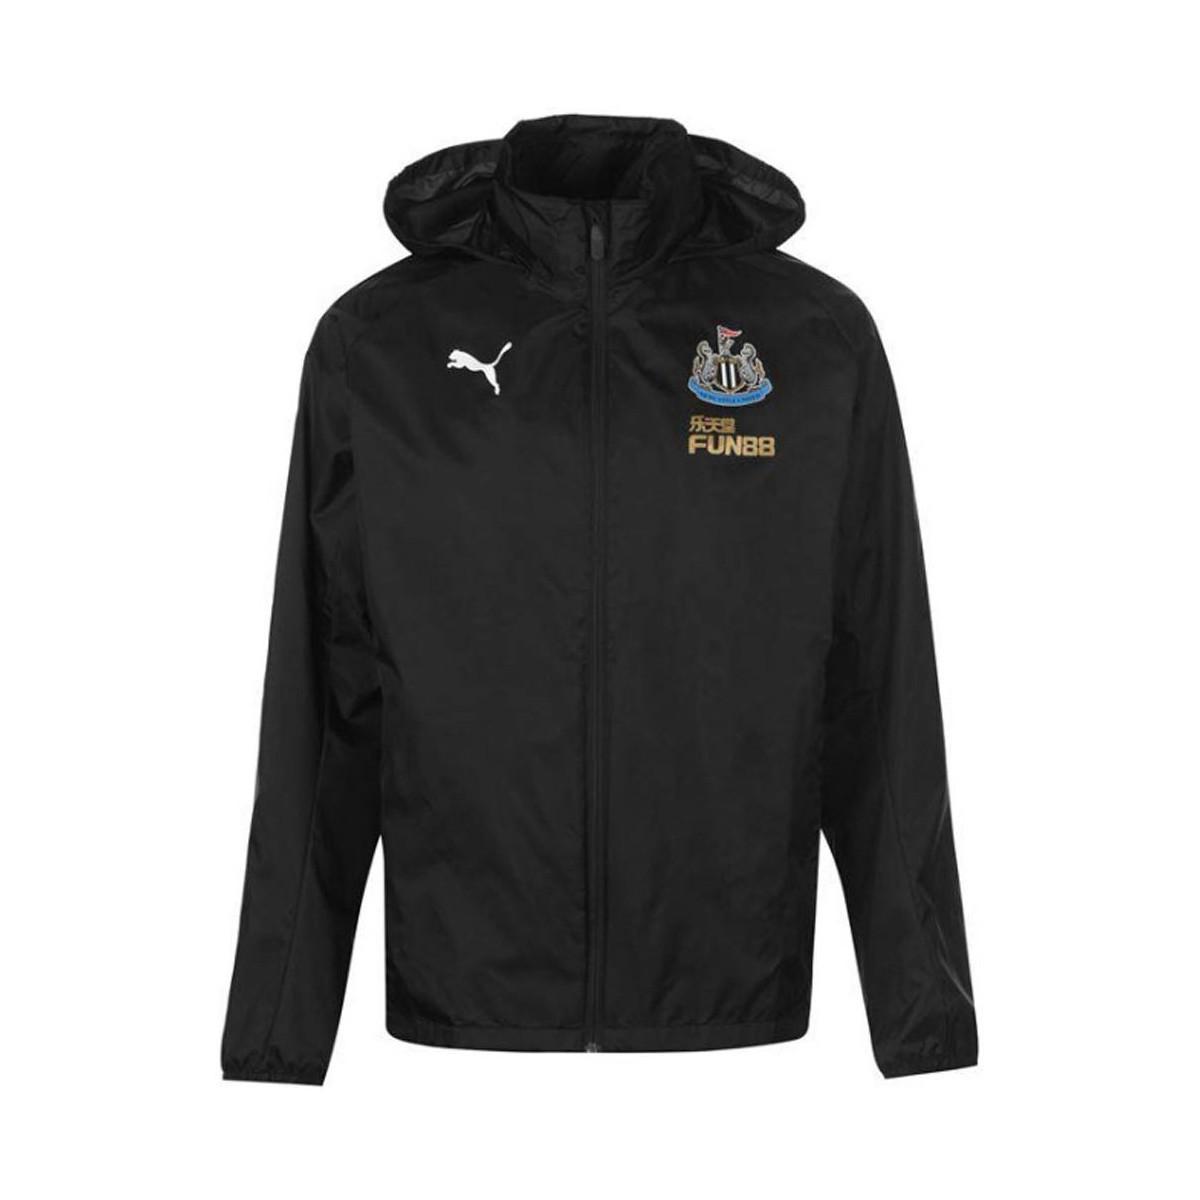 30fdb3326090 Puma 2018-2019 Newcastle Rain Jacket Women s In Black in Black for ...